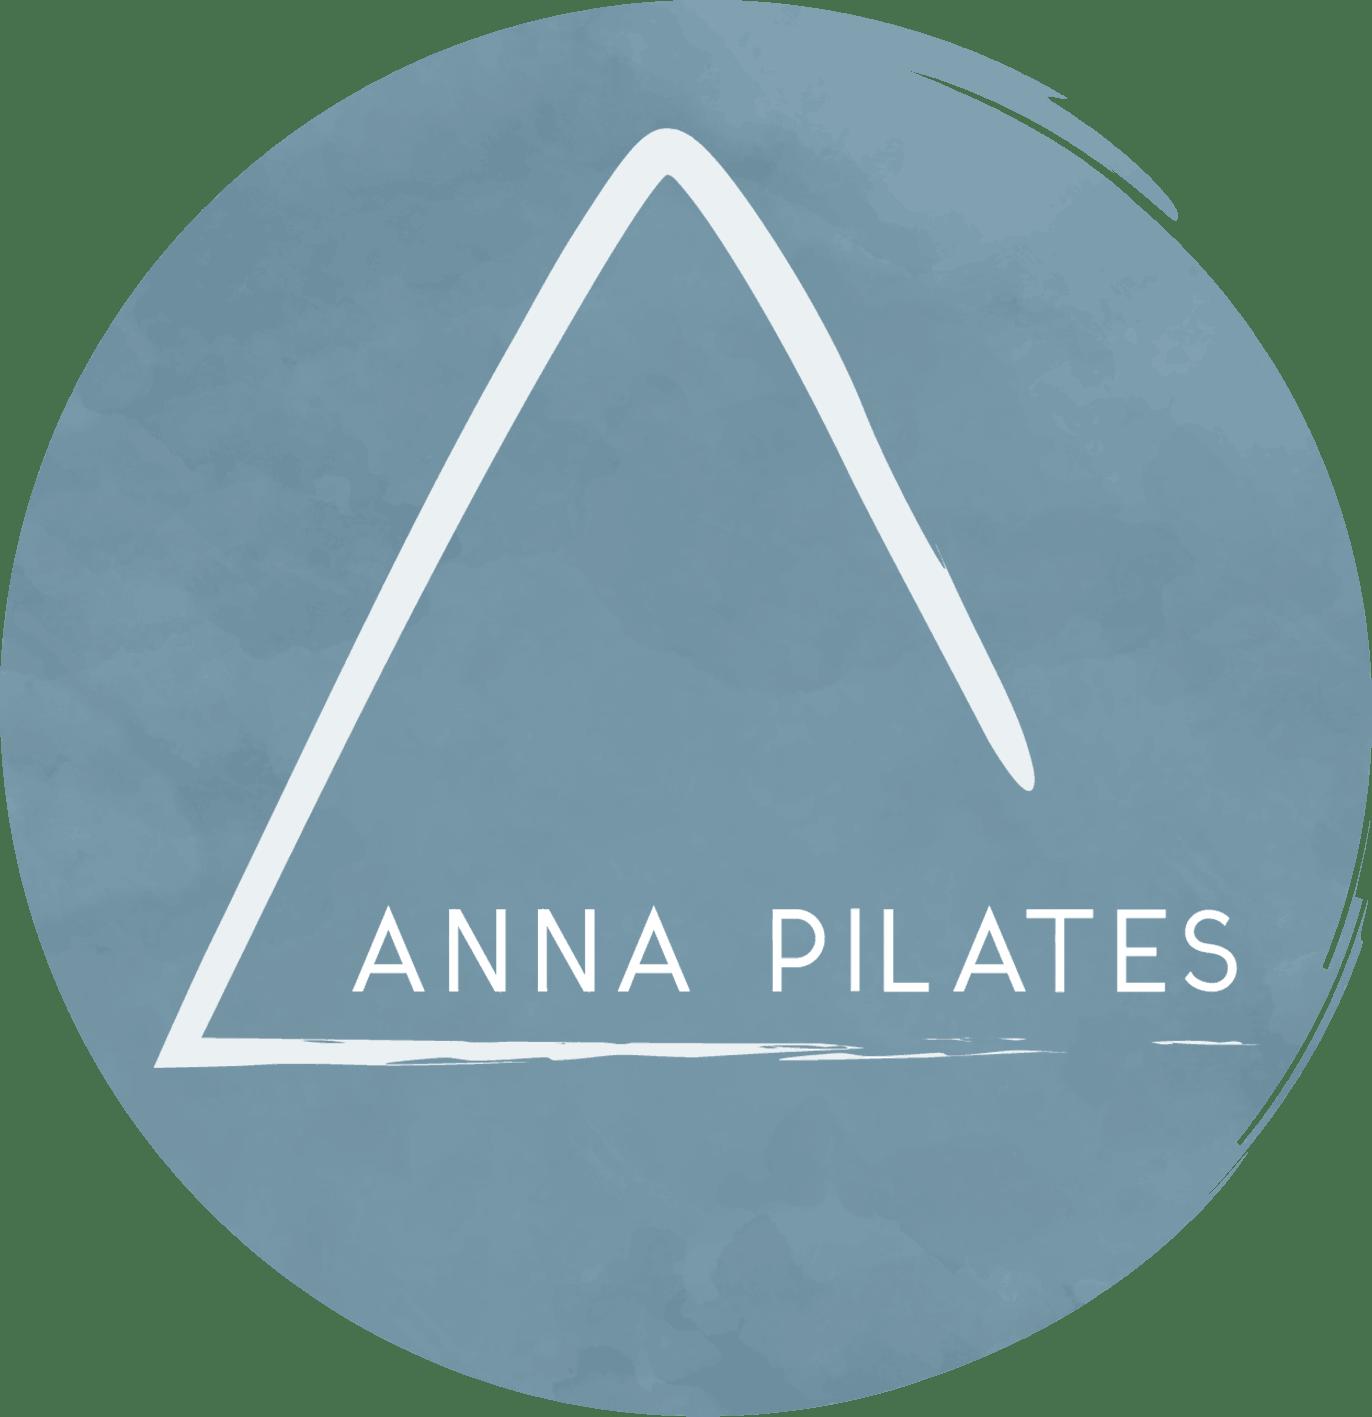 ANNA PILATES